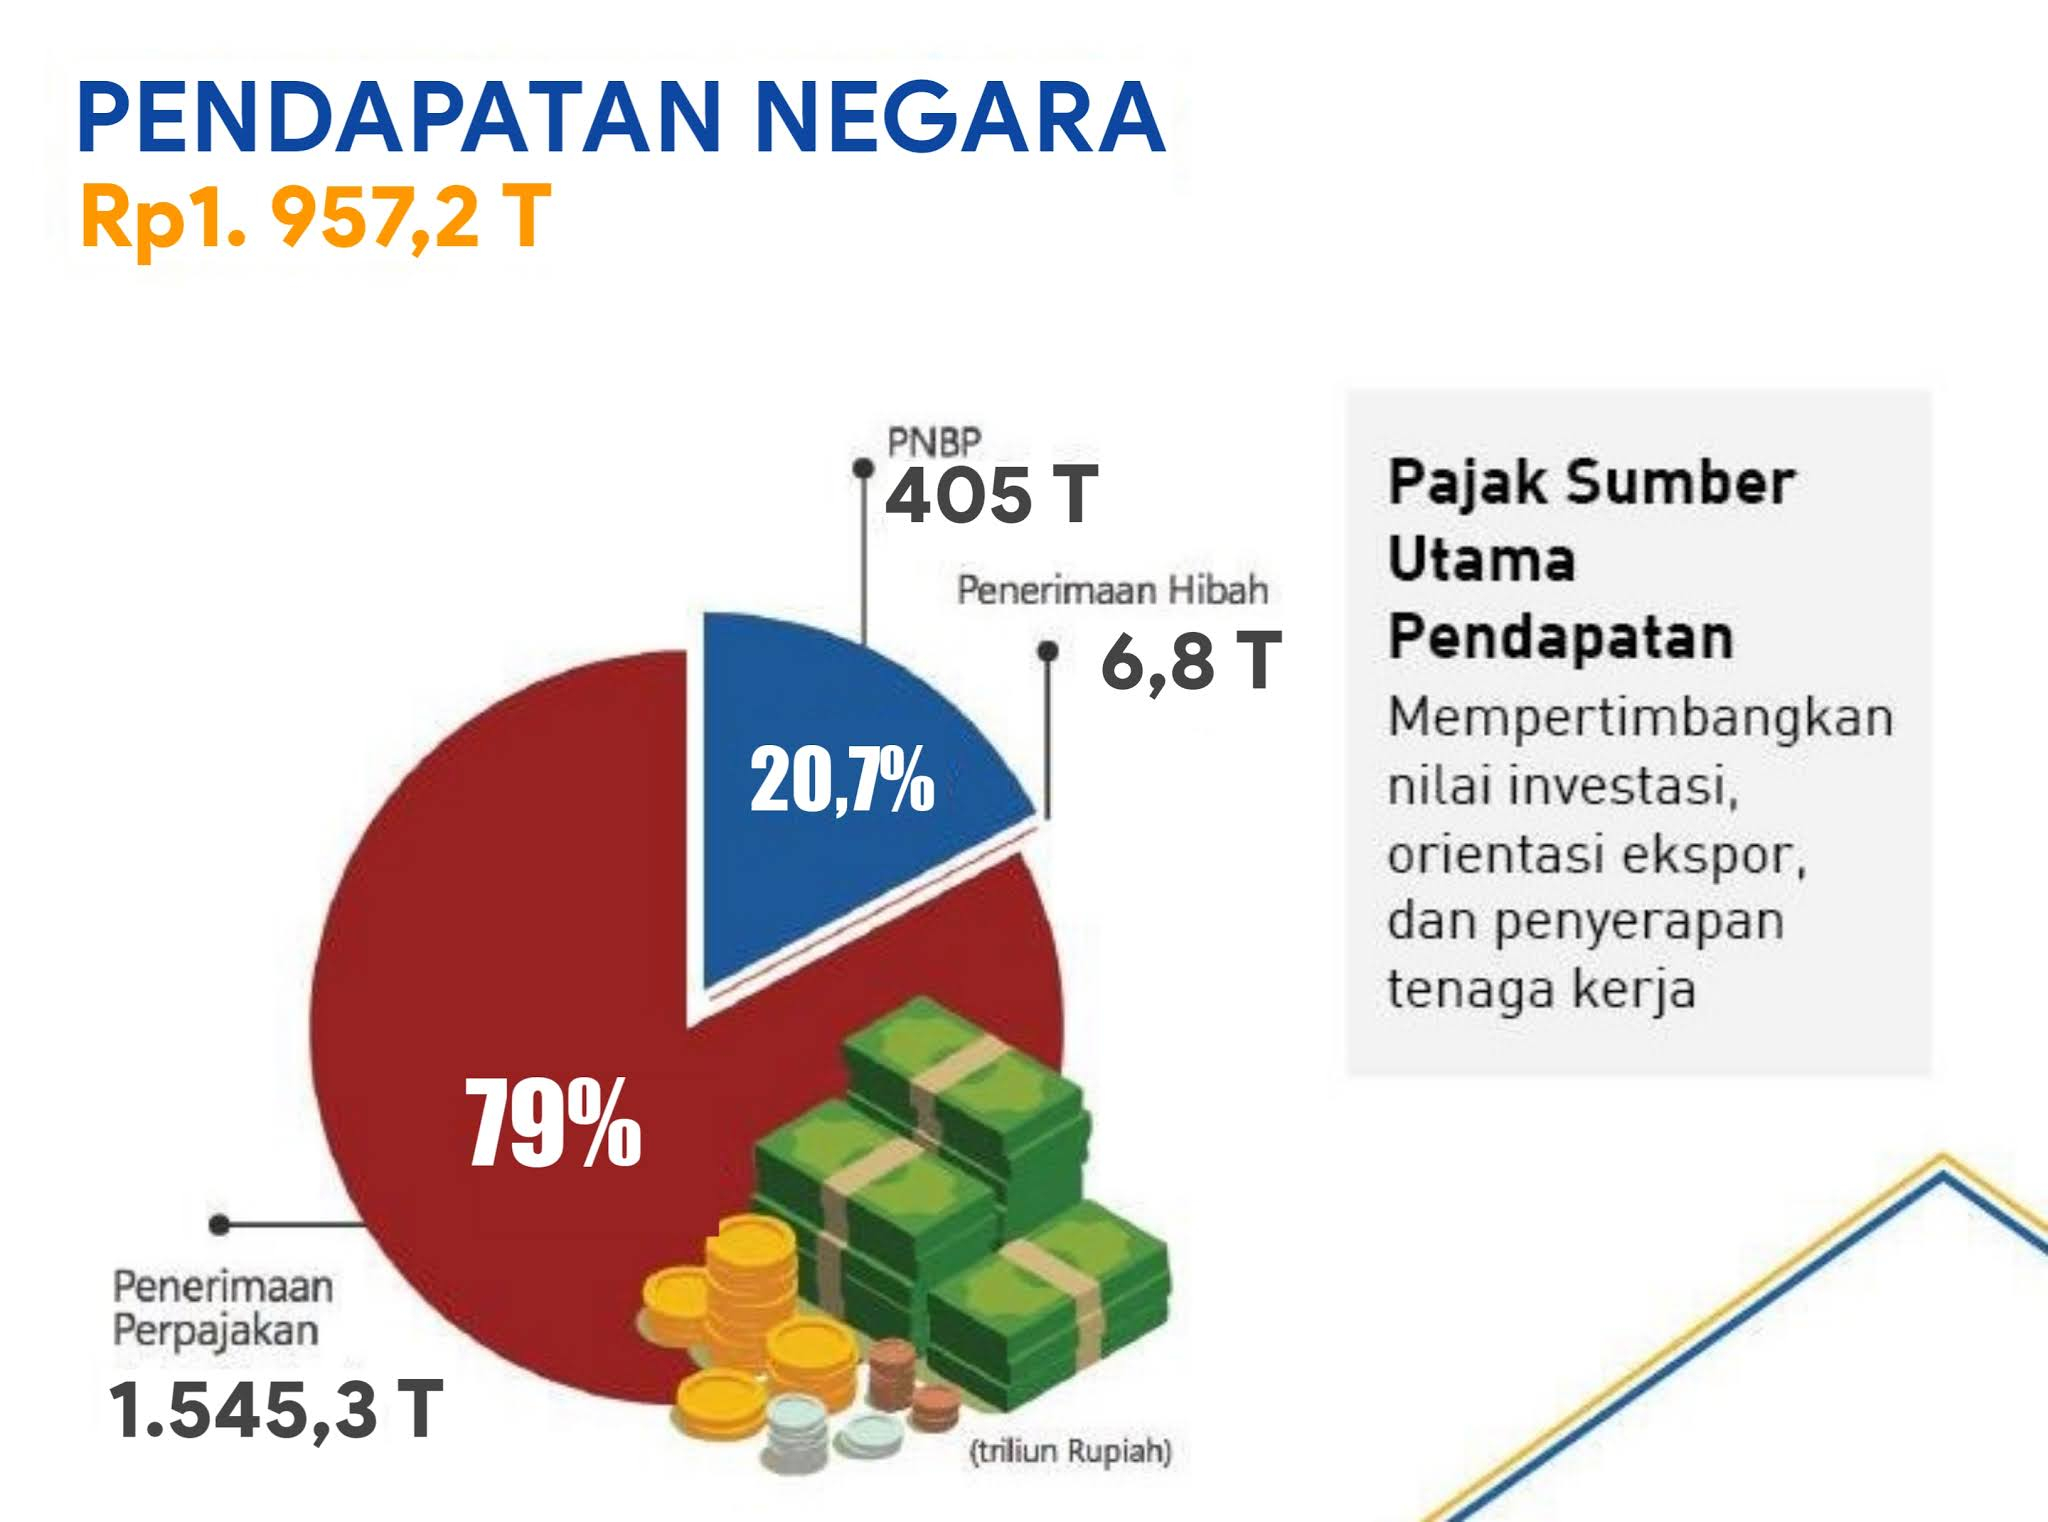 Realisasi Pendapatan Negara Indonesia 2019